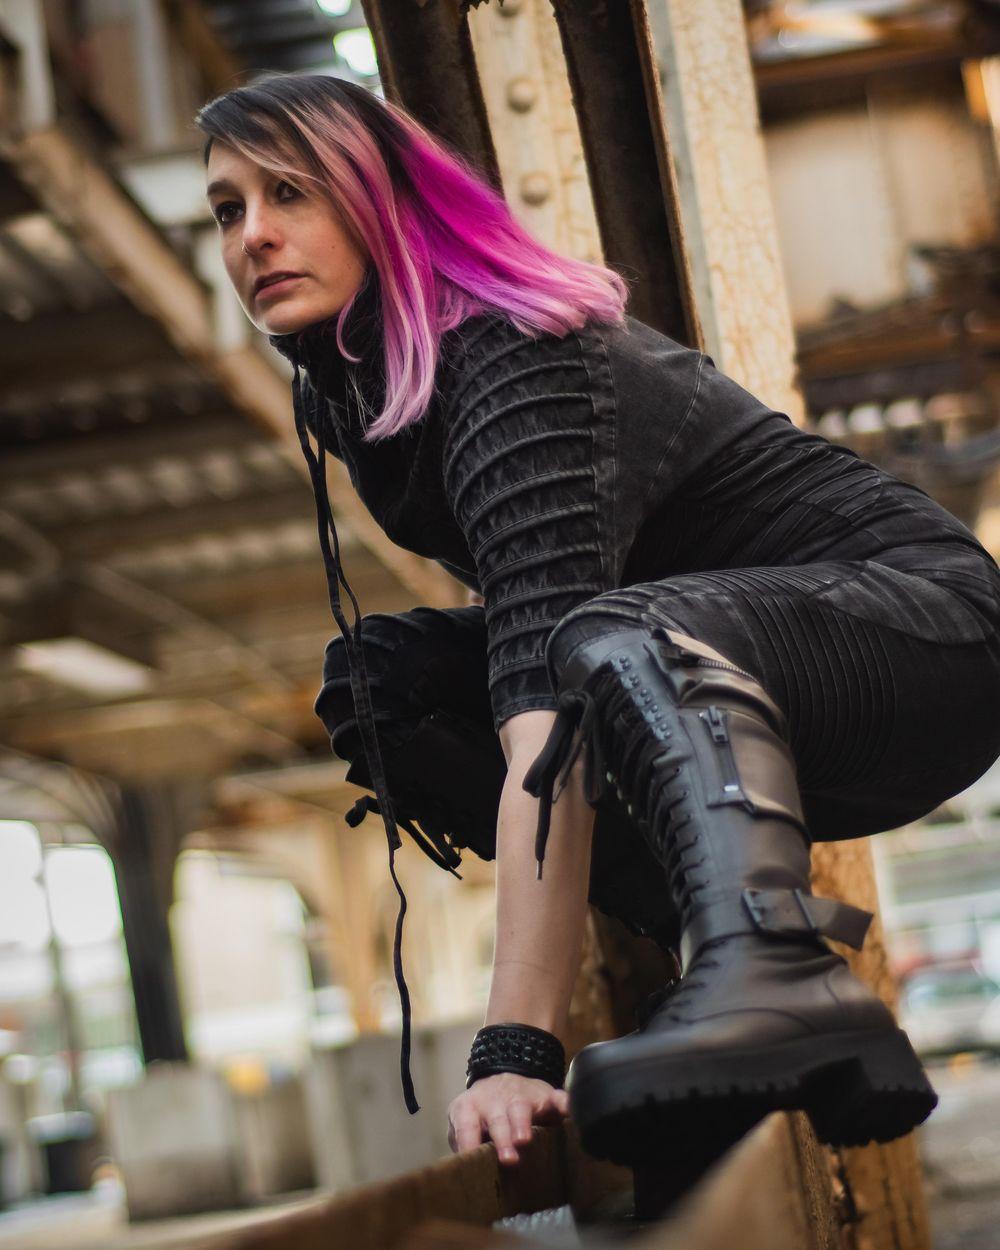 Cyberpunk Fashion Lookbook - image 6 - student project